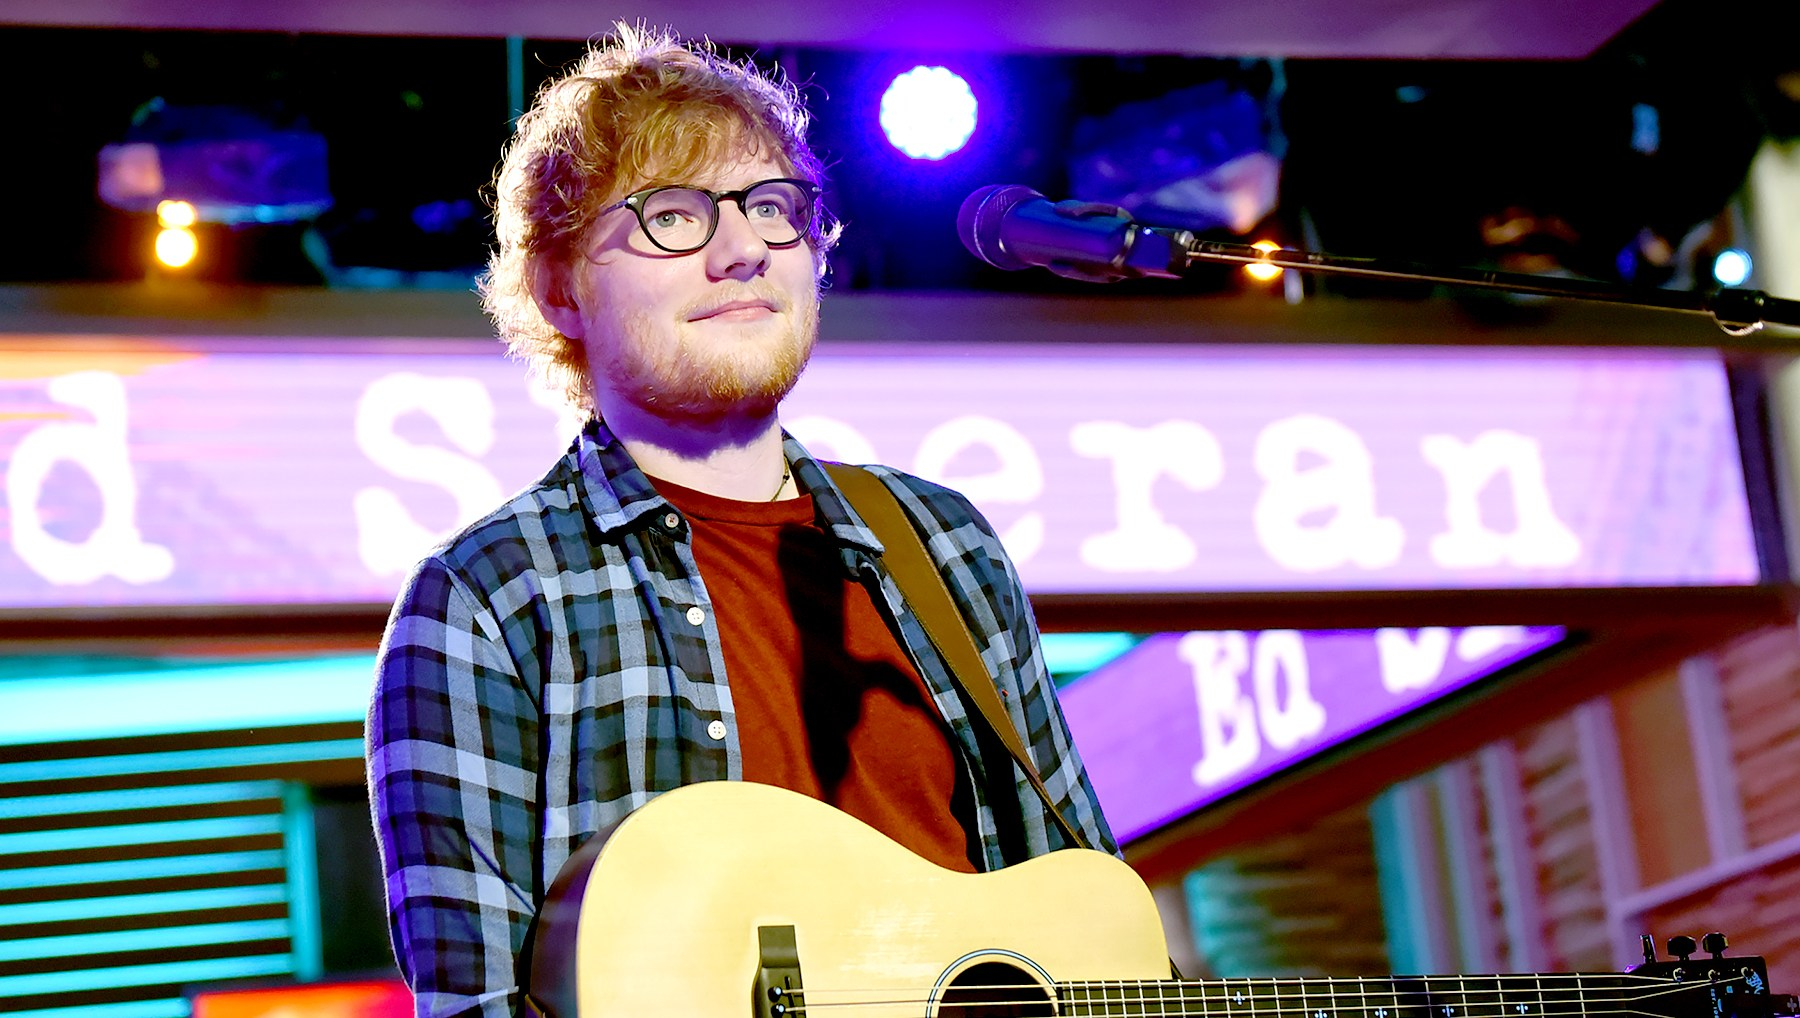 Ed-Sheeran-substance-abuse